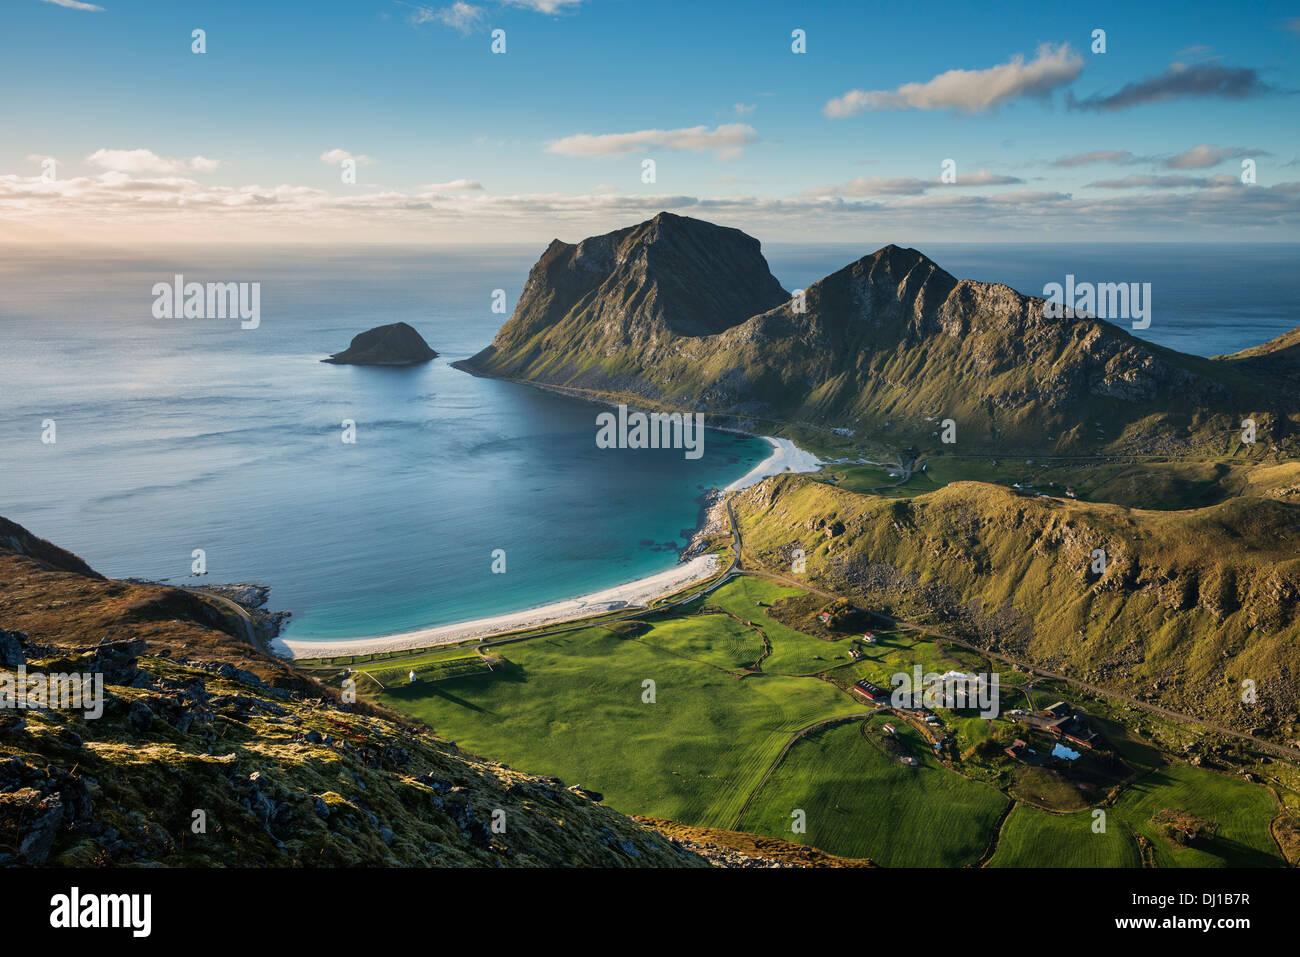 View of Vik and Haukland beaches from summit of Holandsmelen mountain peak, Vestvagoy, Lofoten Islands, Norway Stock Photo